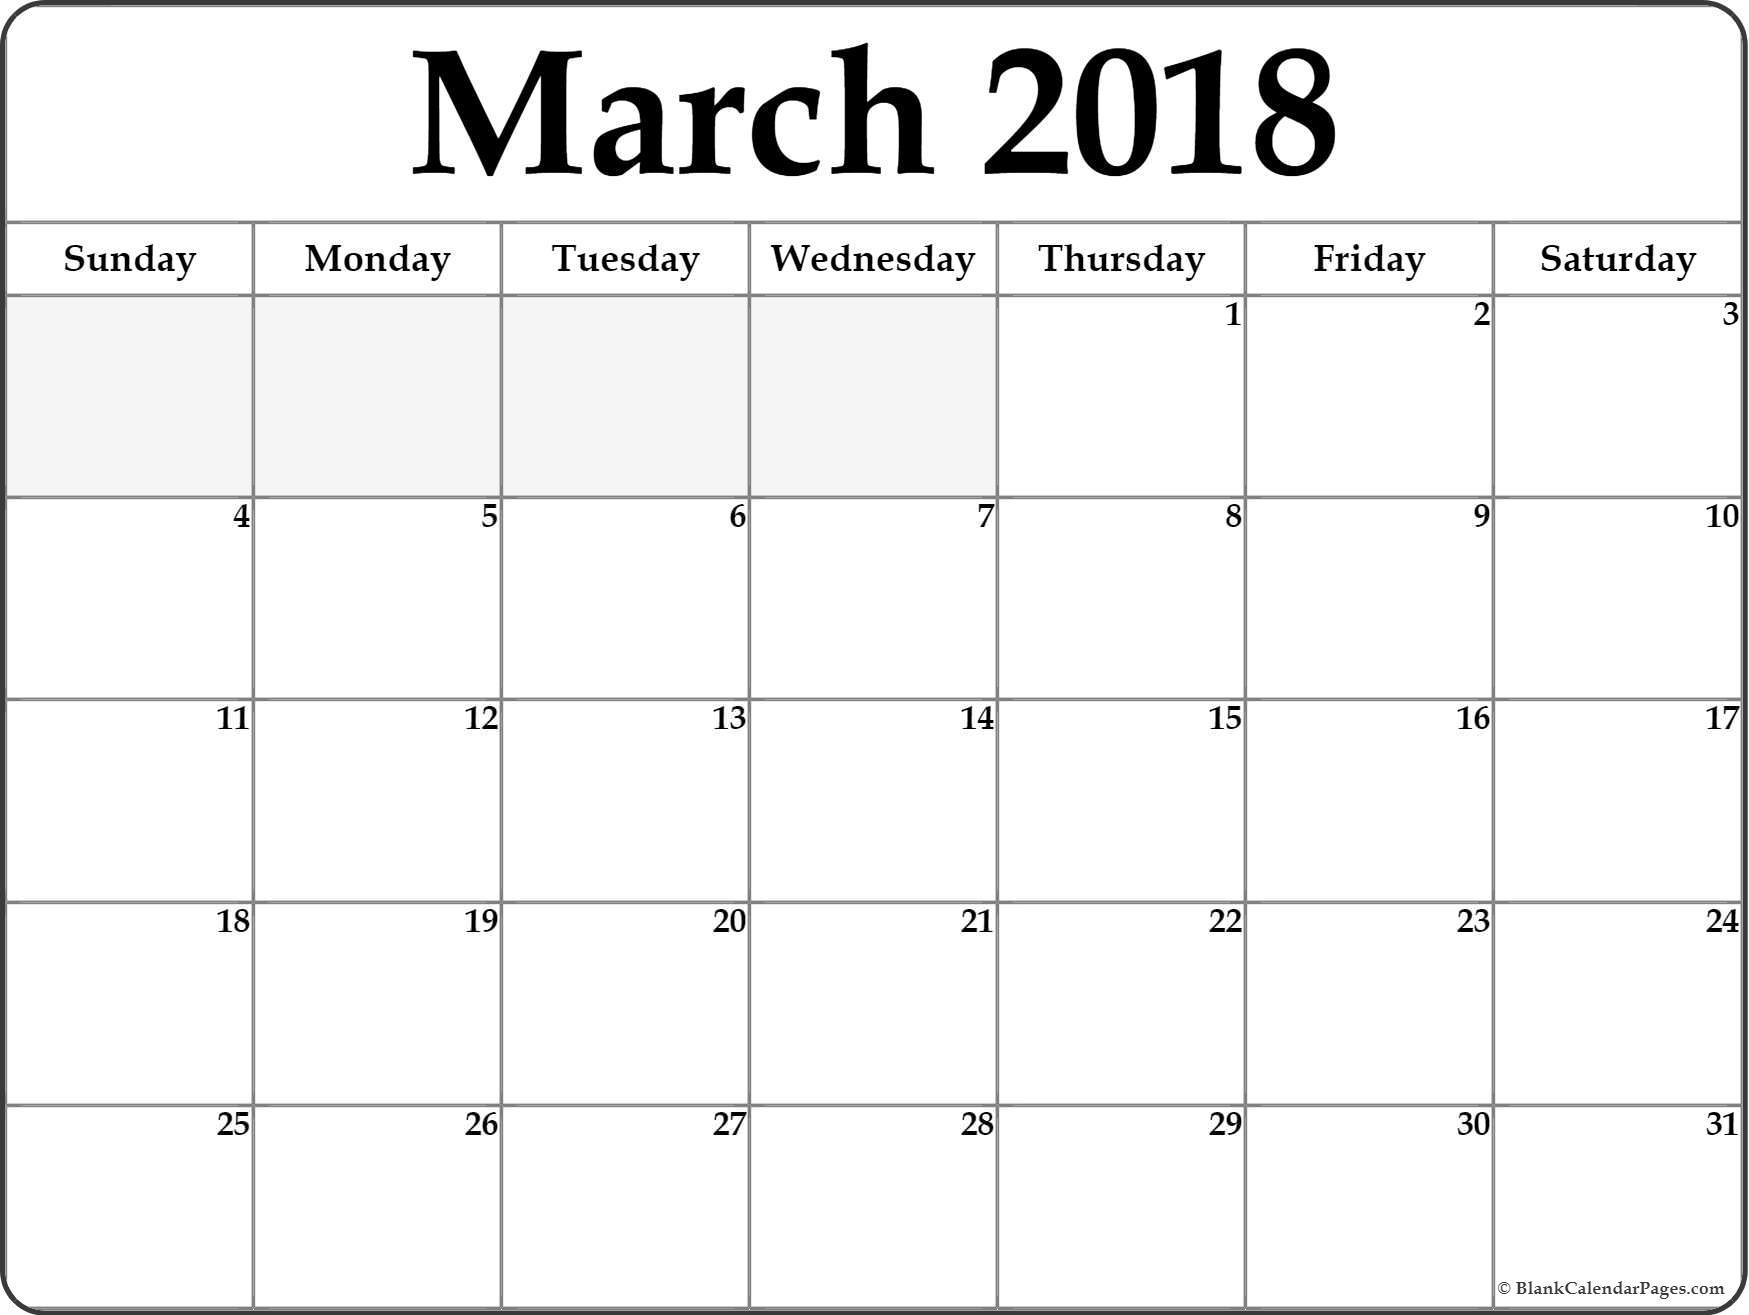 March 2018 Blank Calendar Templates